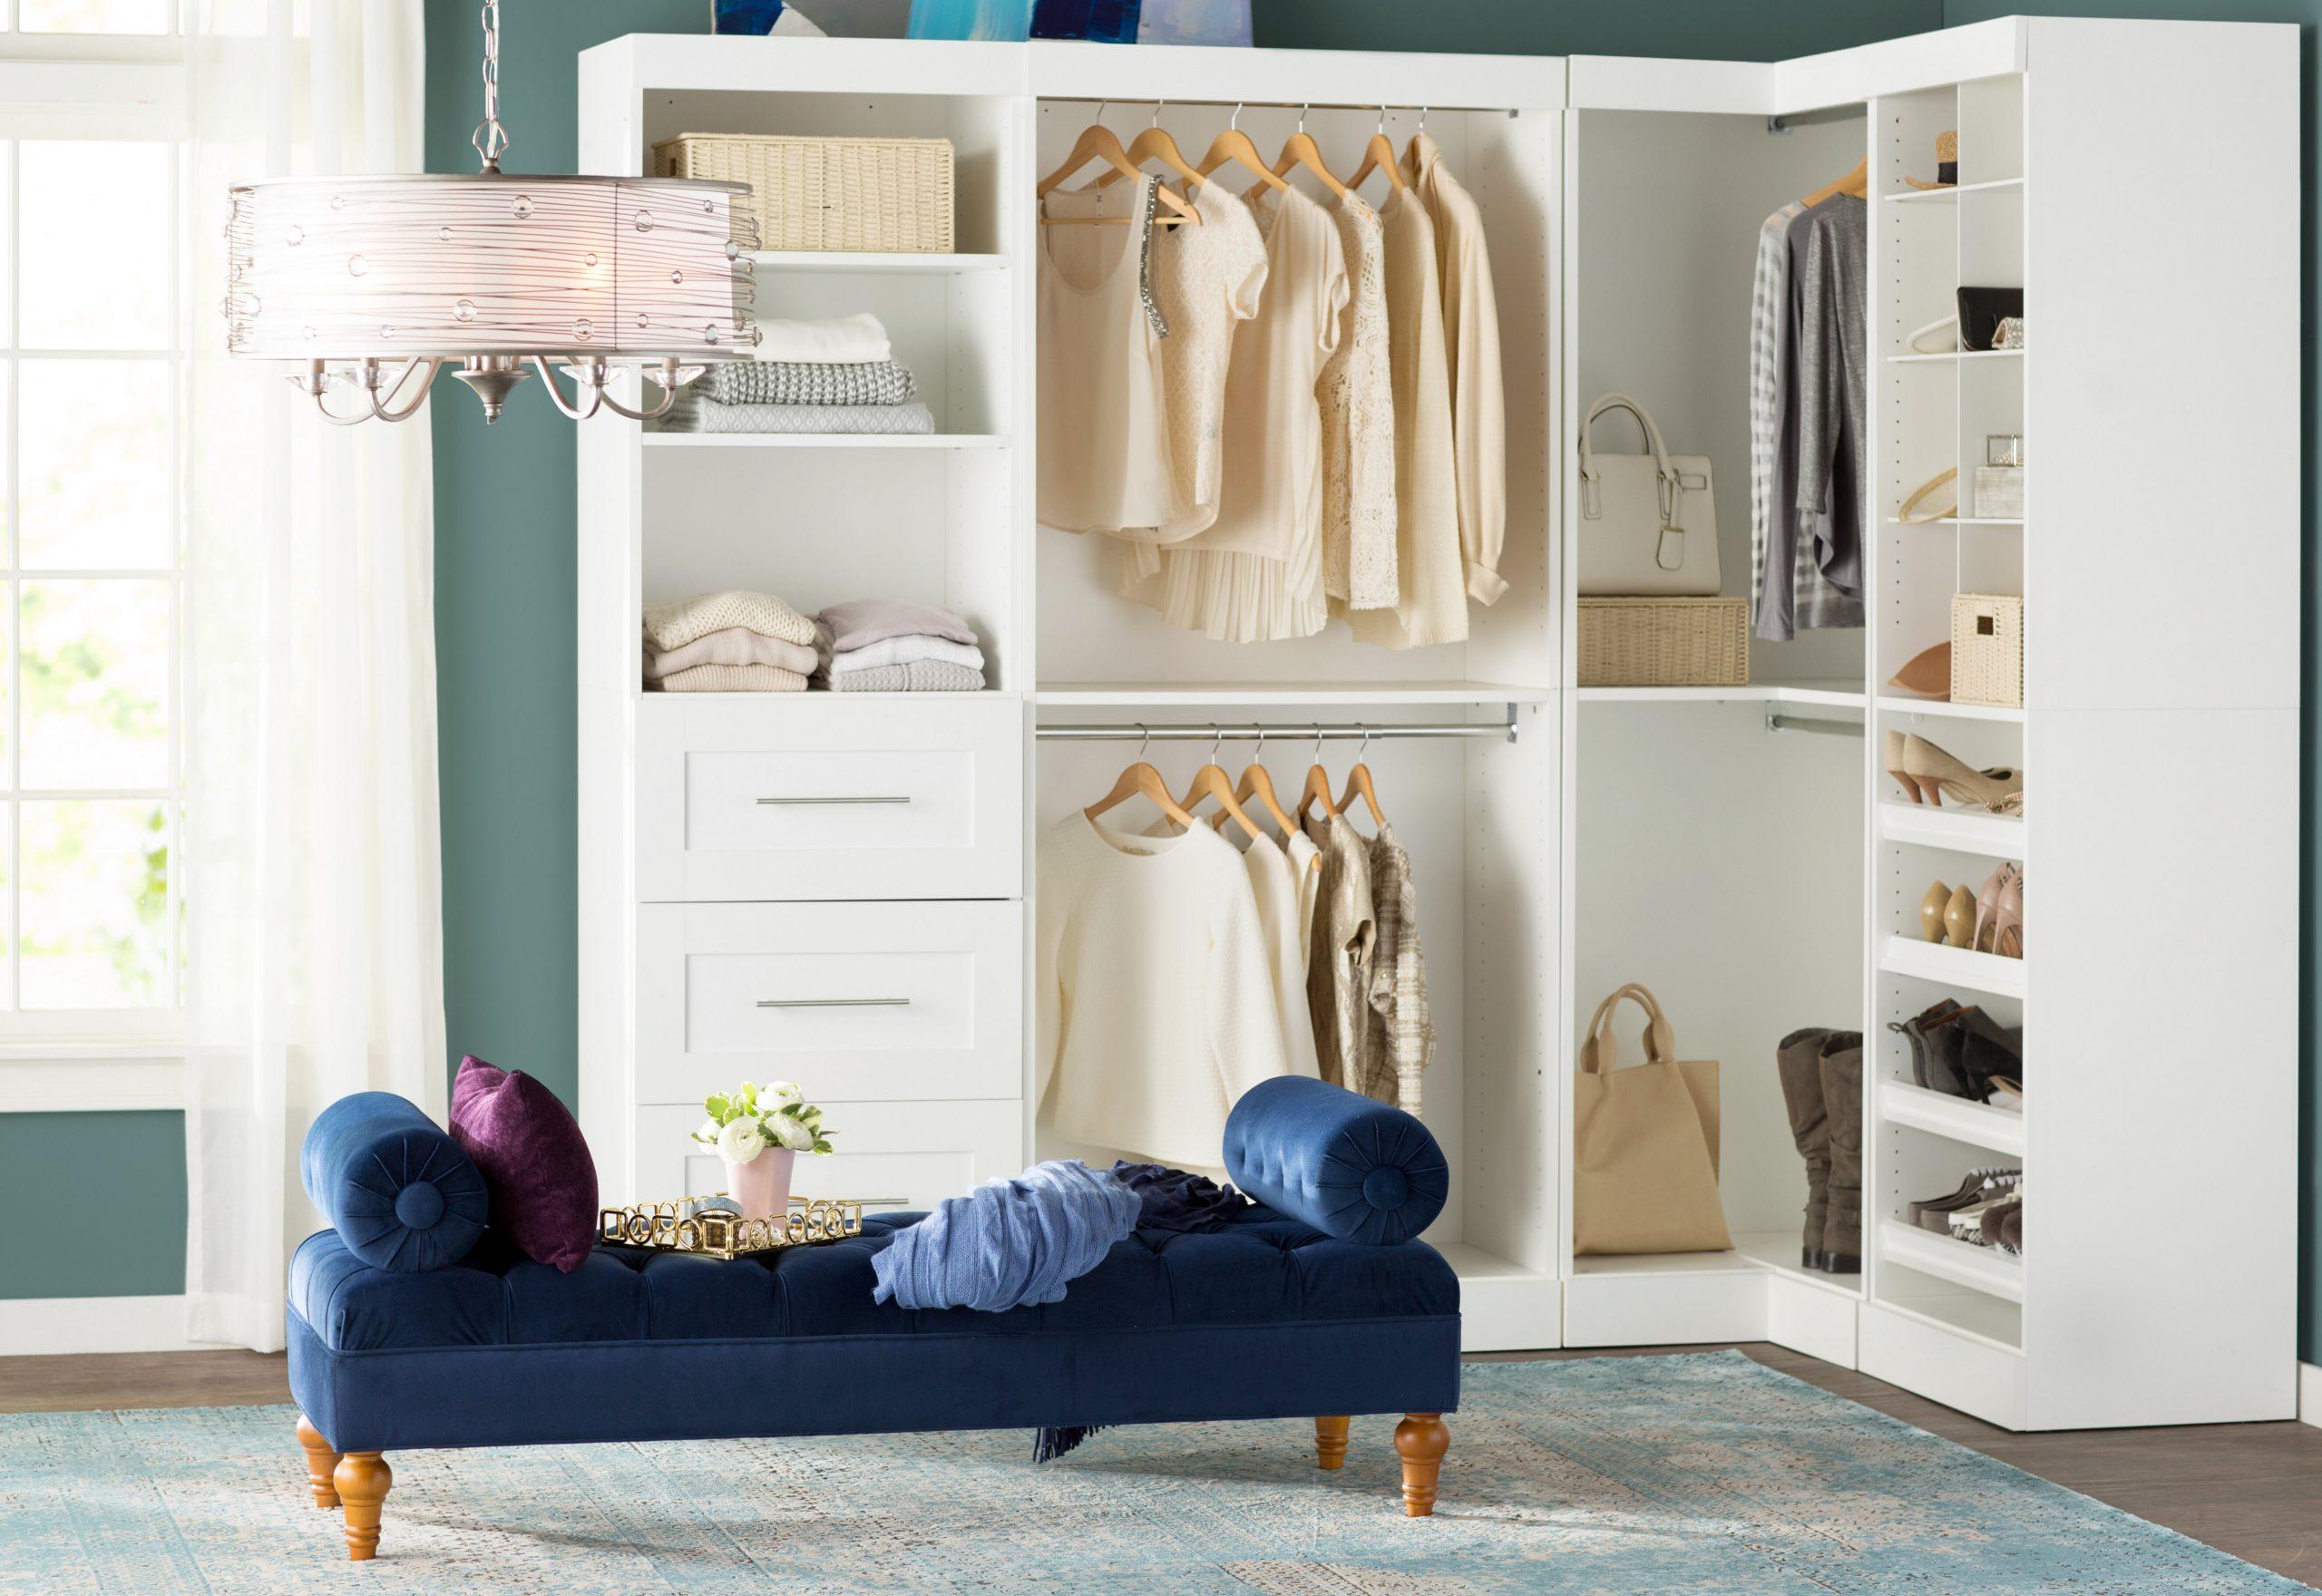 Closet Organization Ideas in 12 Easy Steps  Wayfair